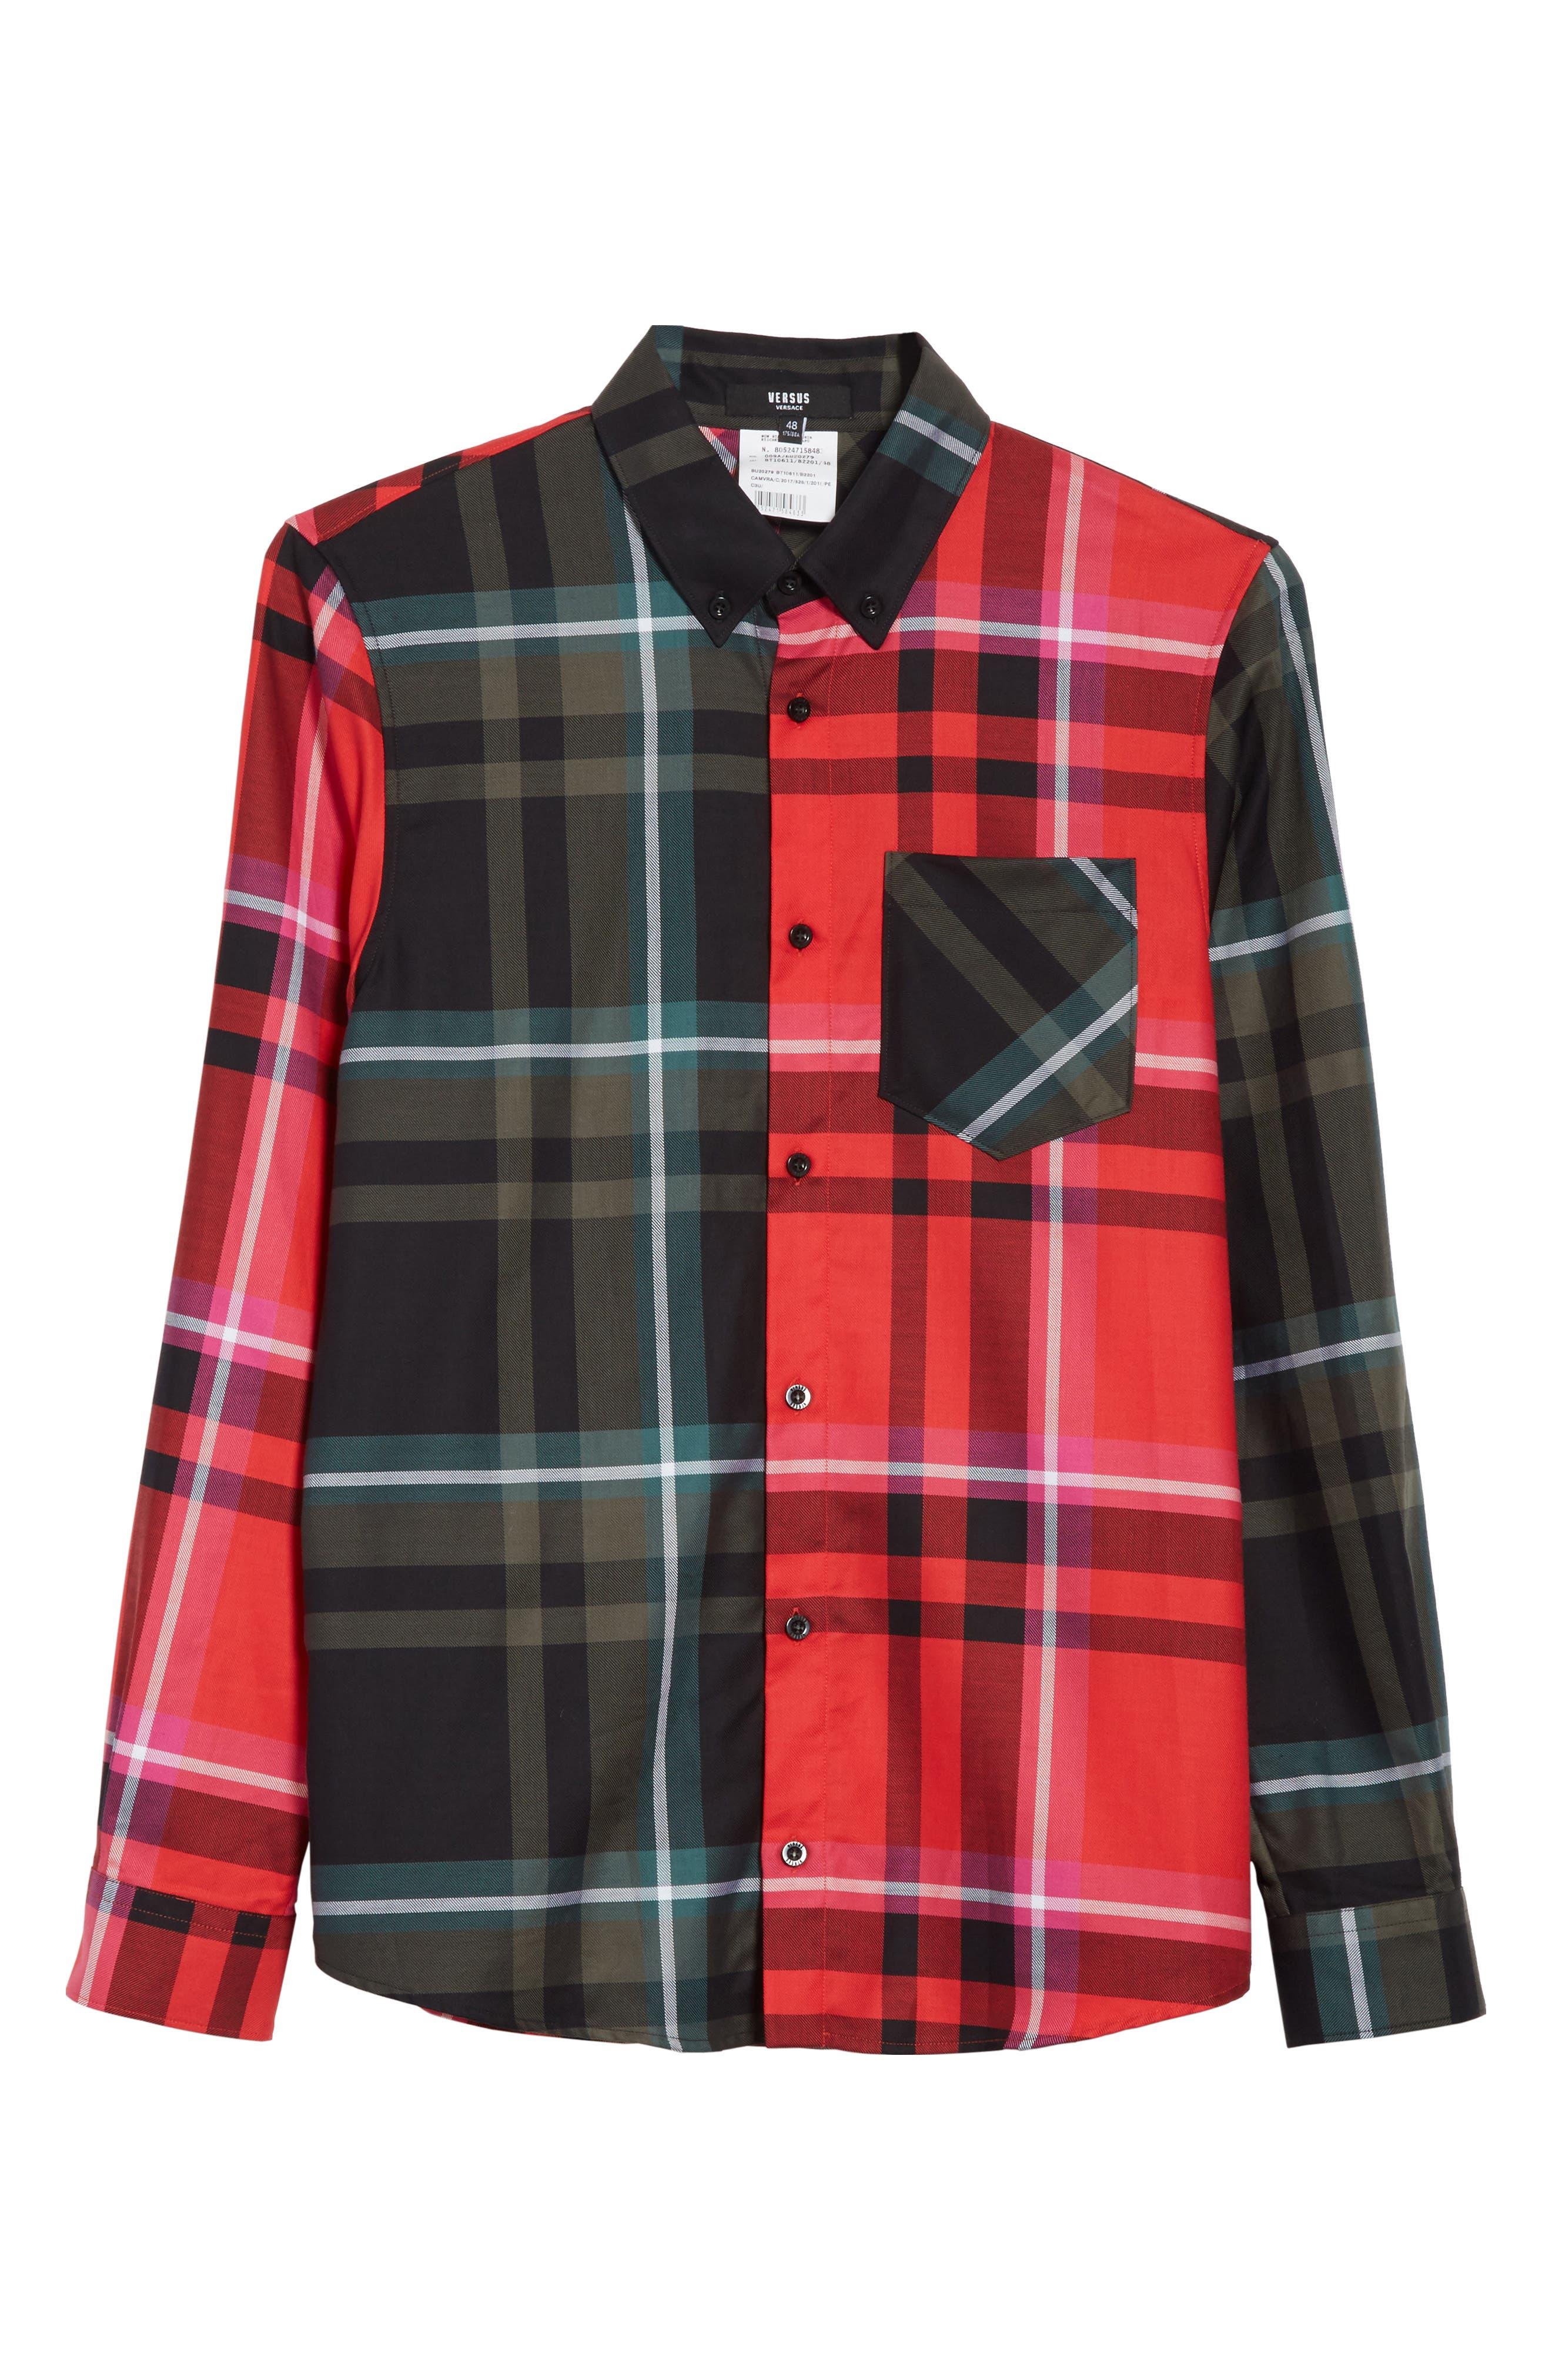 VERSUS by Versace Plaid Woven Shirt,                             Alternate thumbnail 6, color,                             647